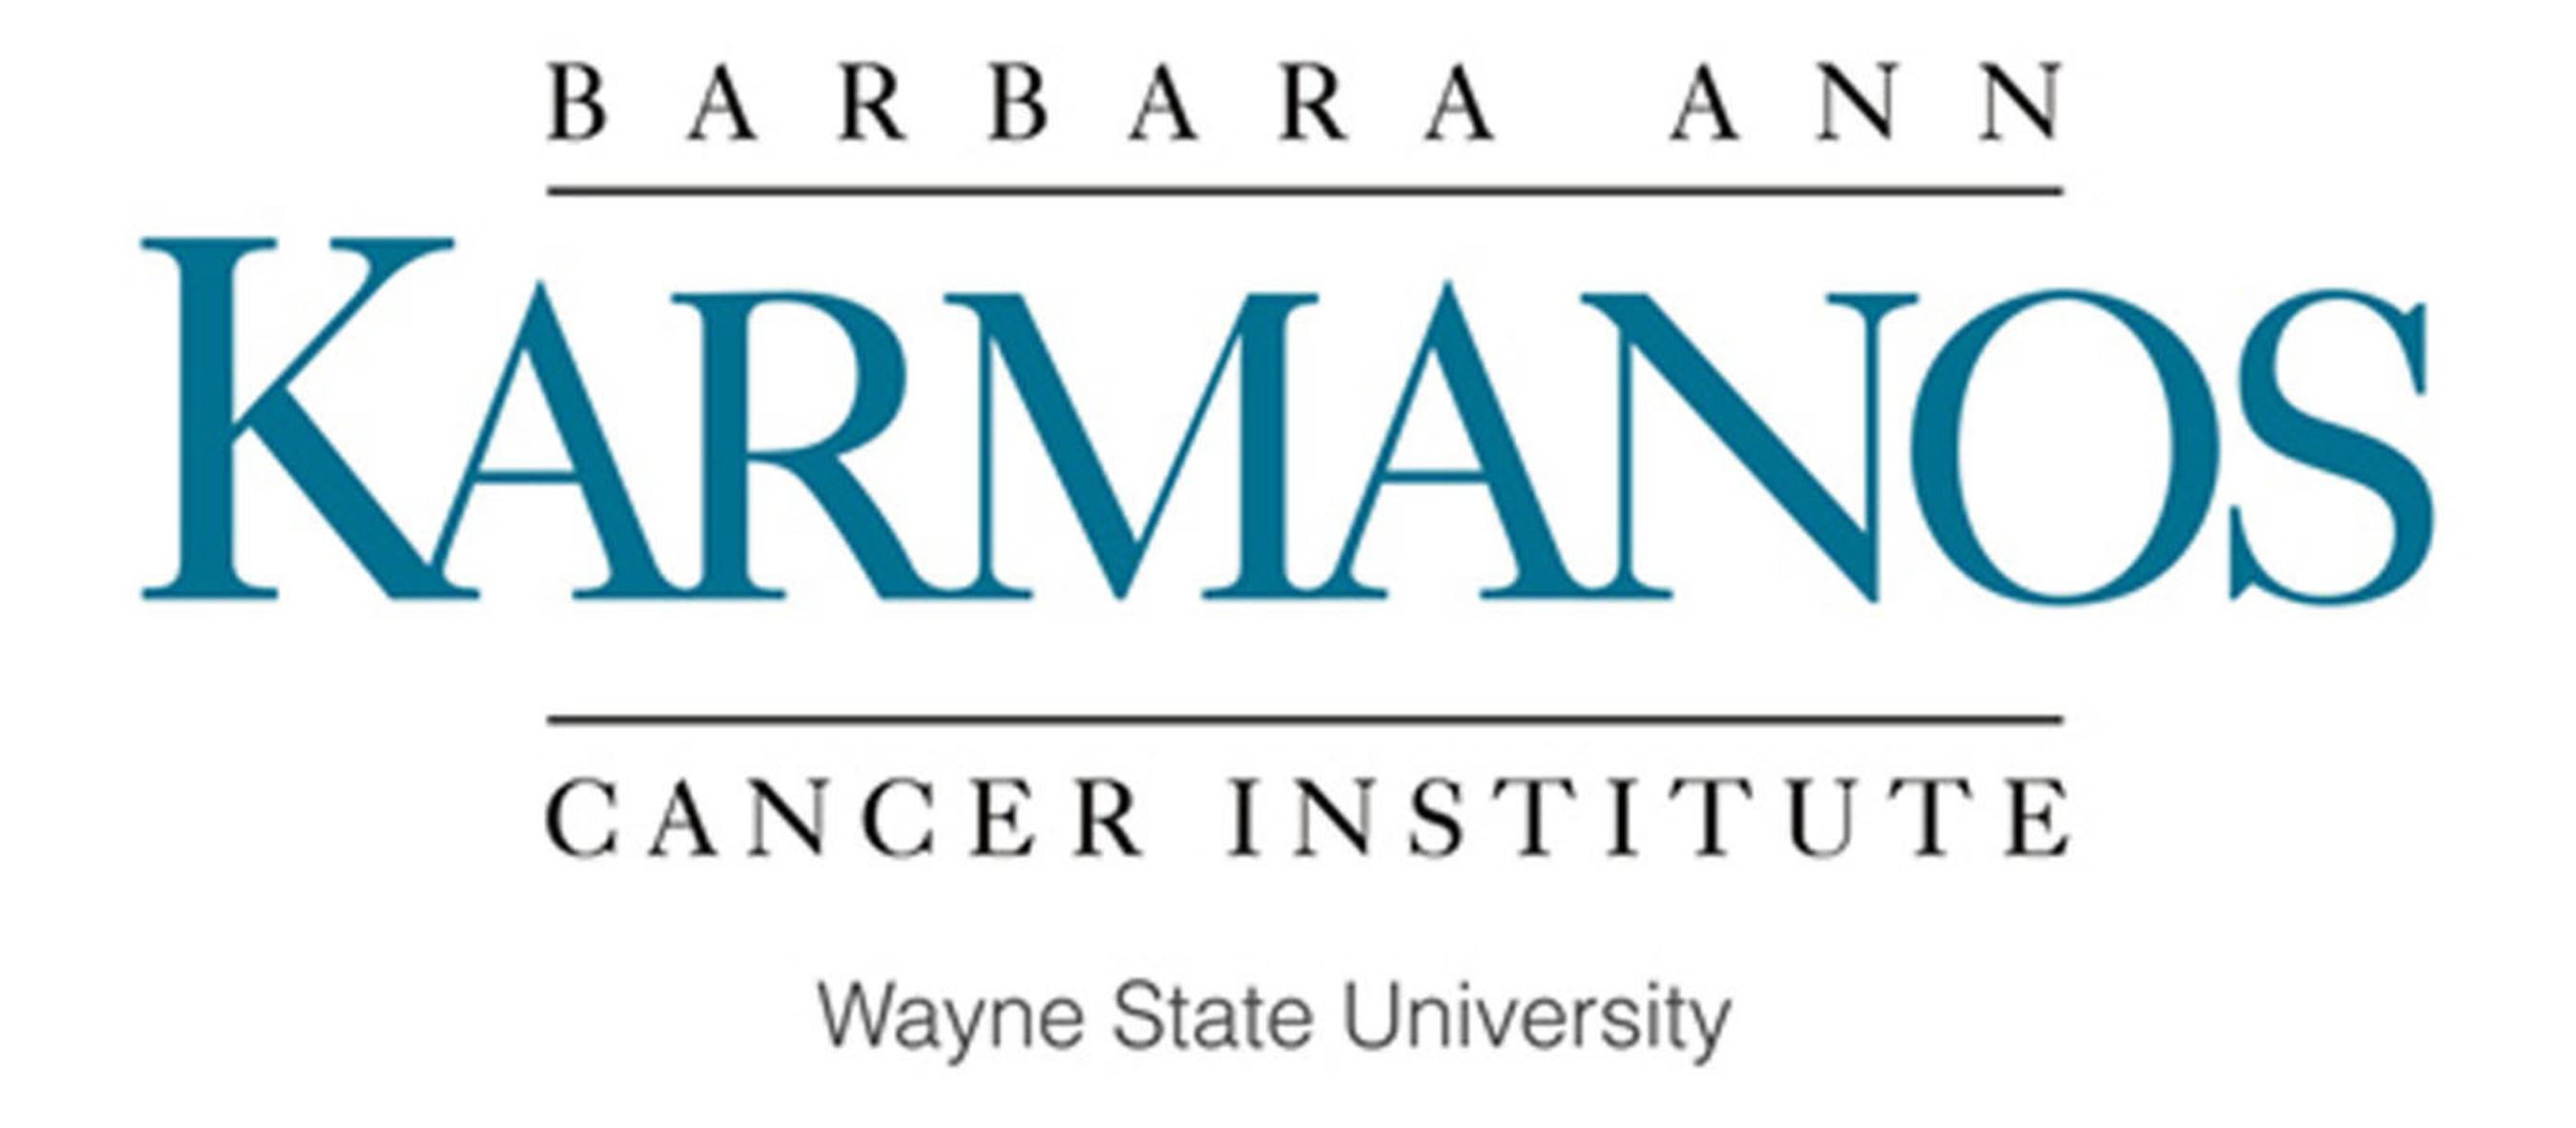 Barbara Ann Karmanos Cancer Institute Logo.